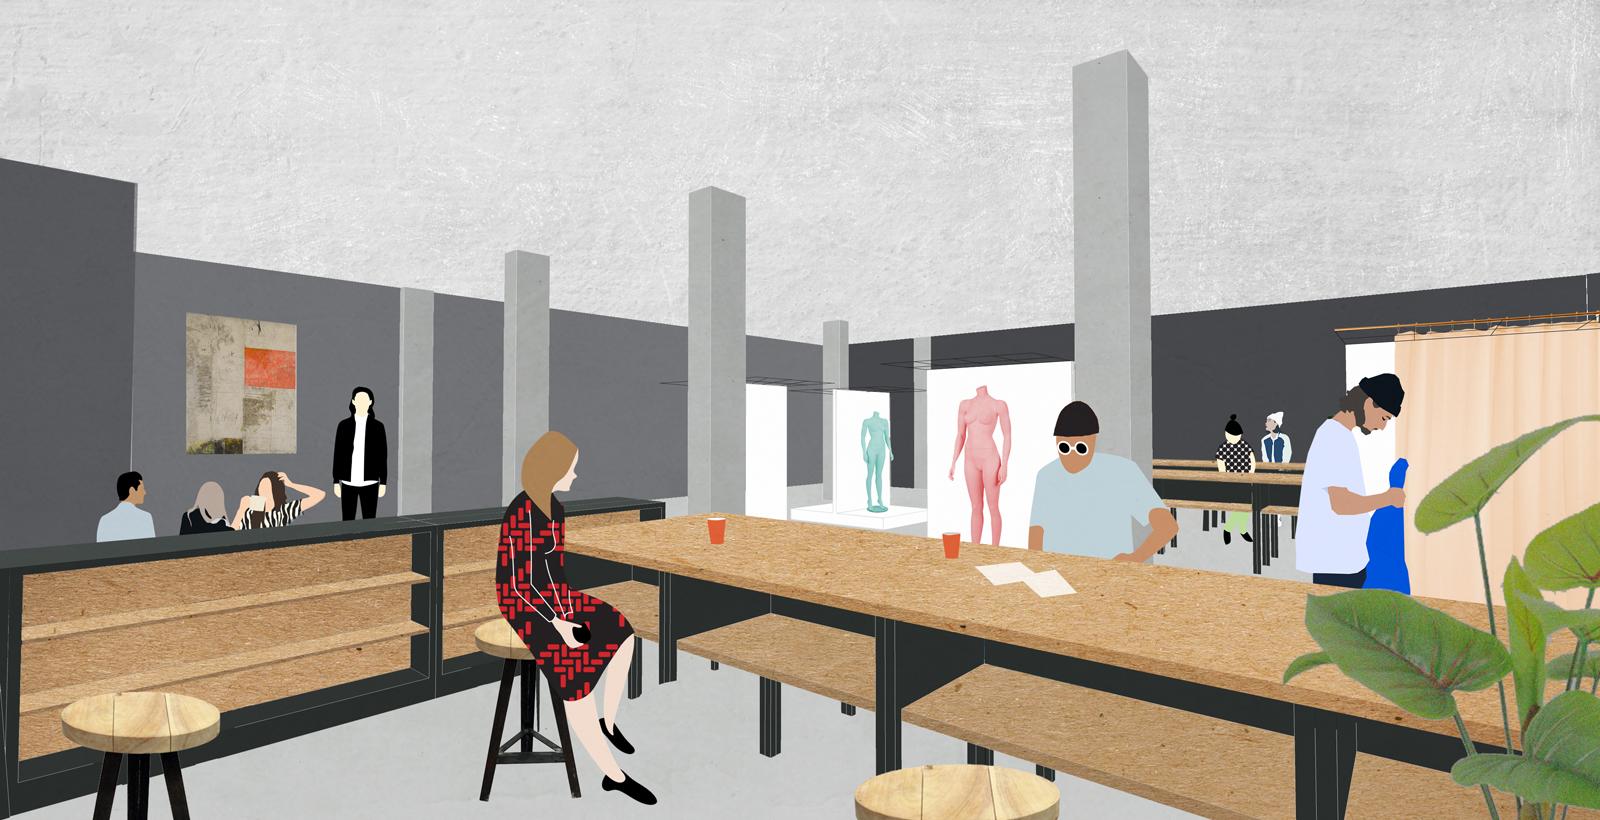 interieur_school_architect_transformatie_renovatie